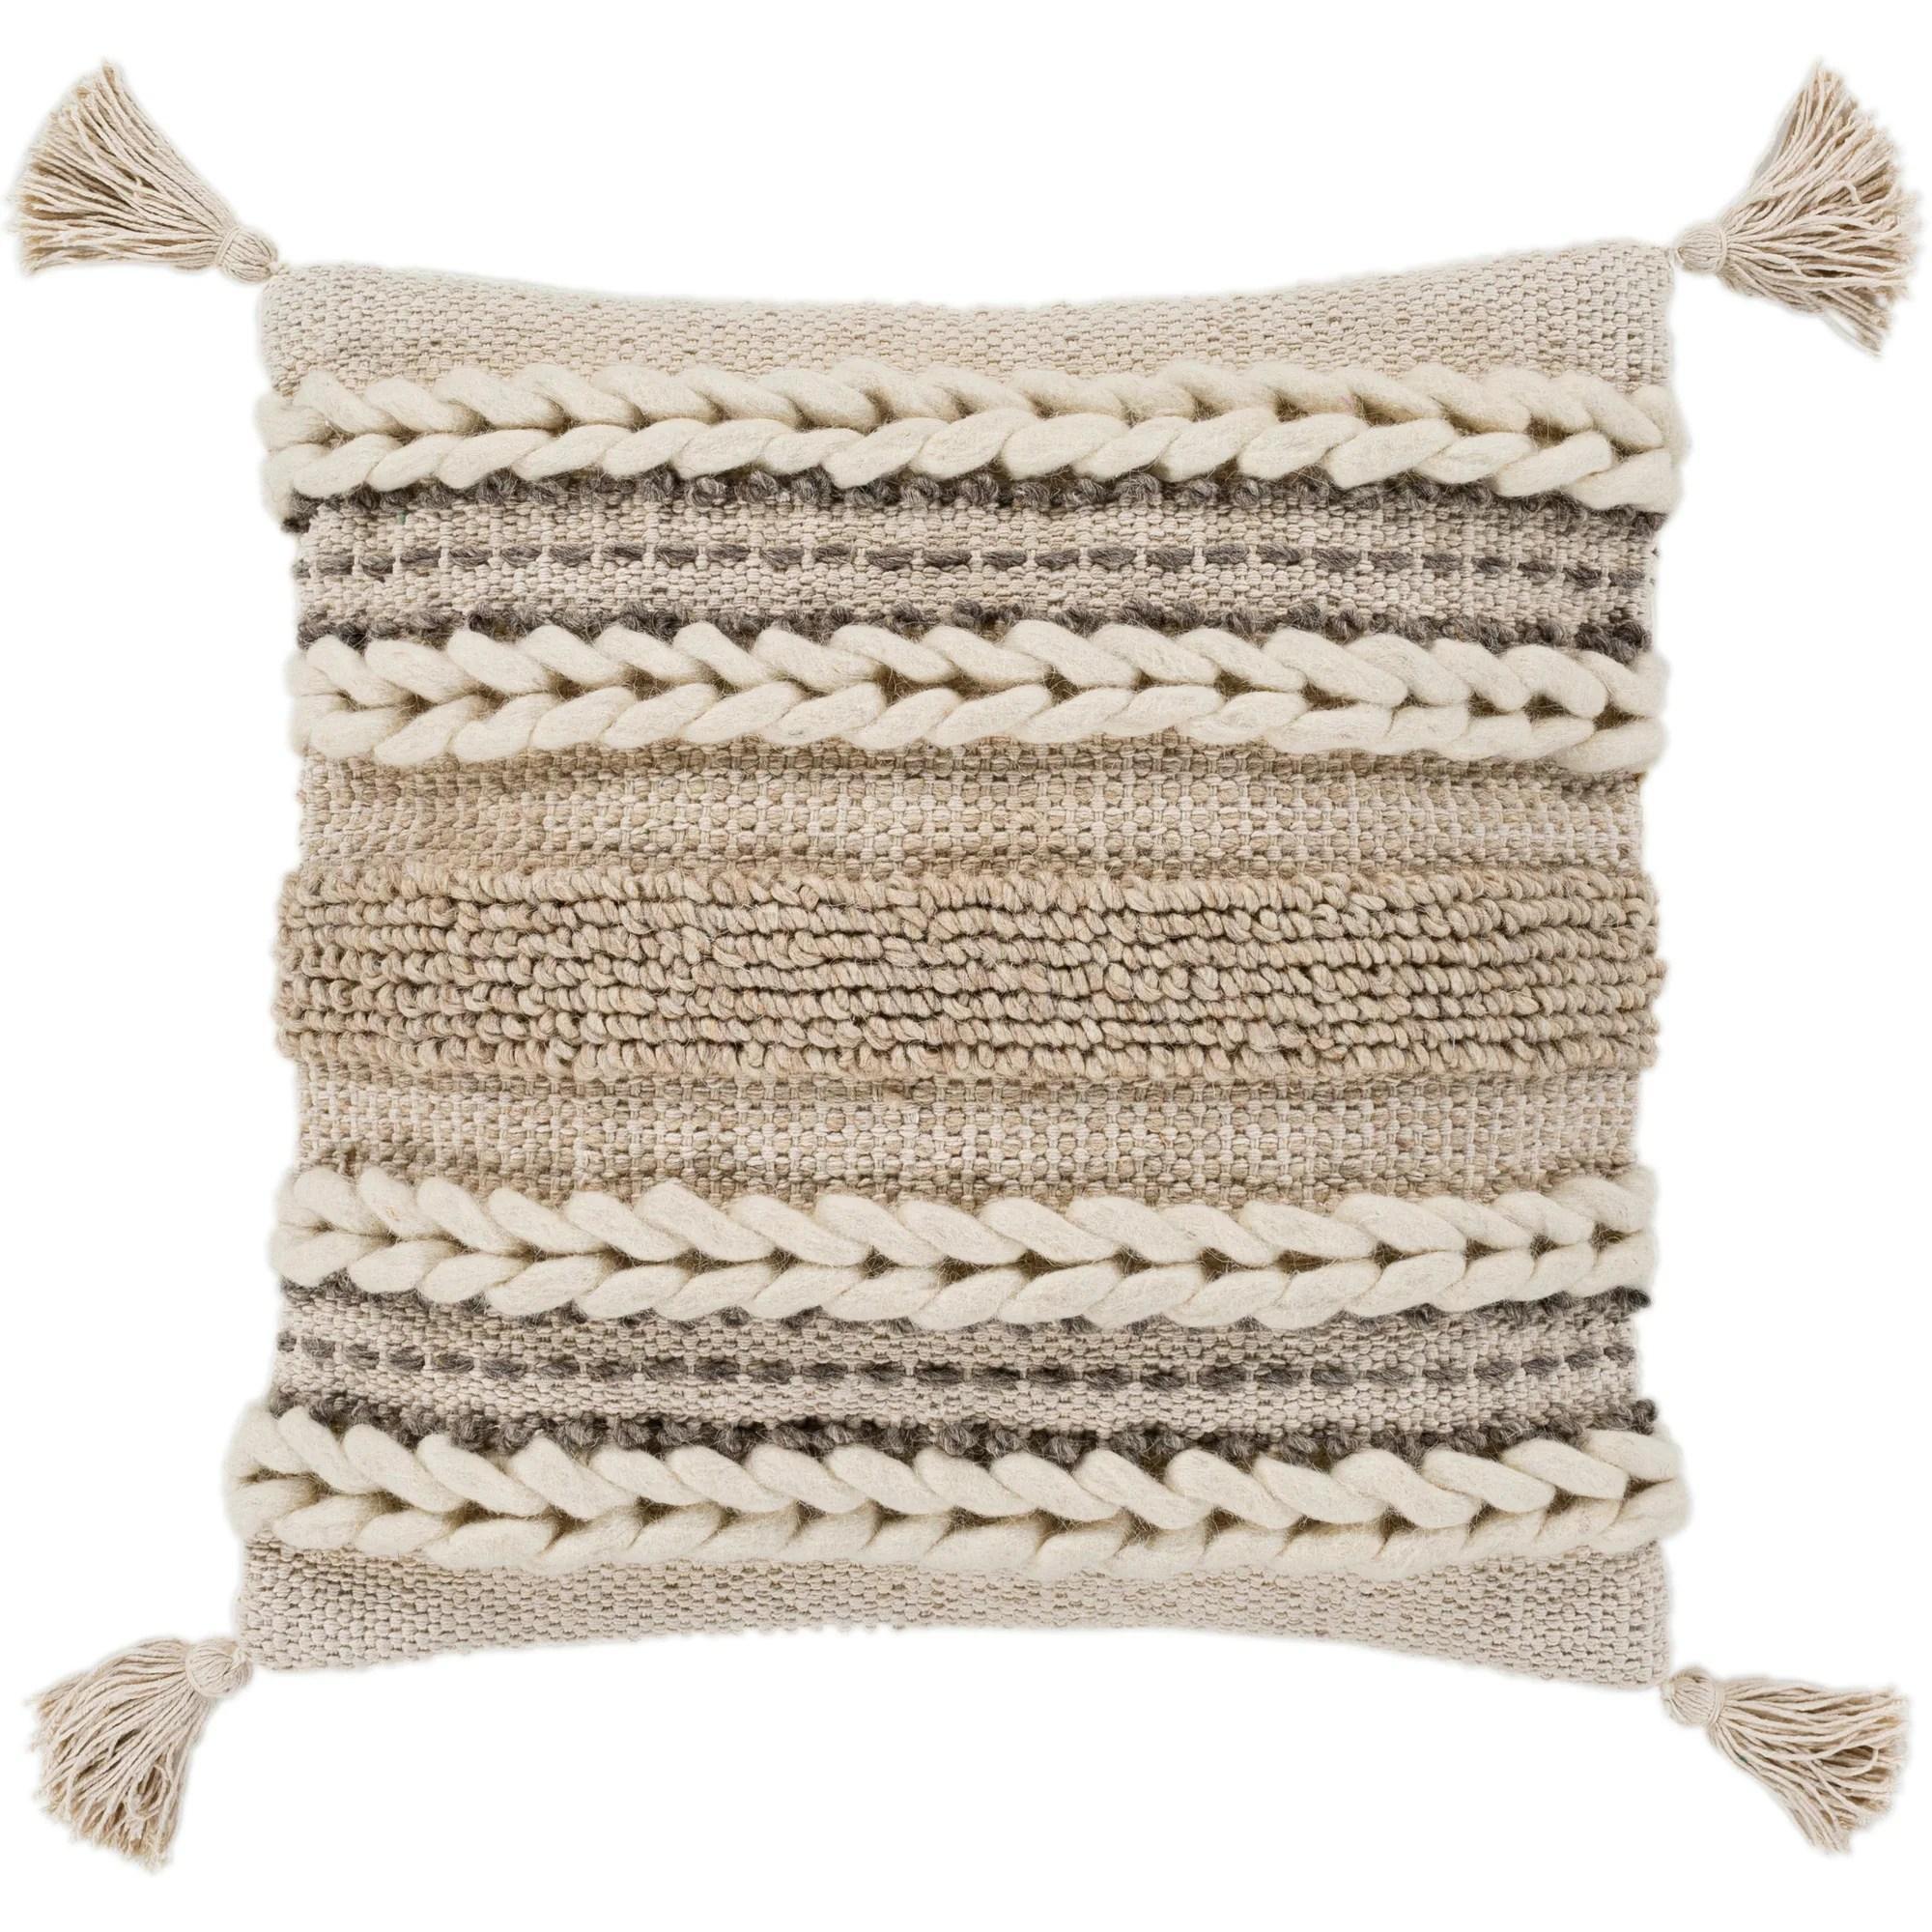 goa taupe bohemian tassel wool throw pillow cover 20 x 20